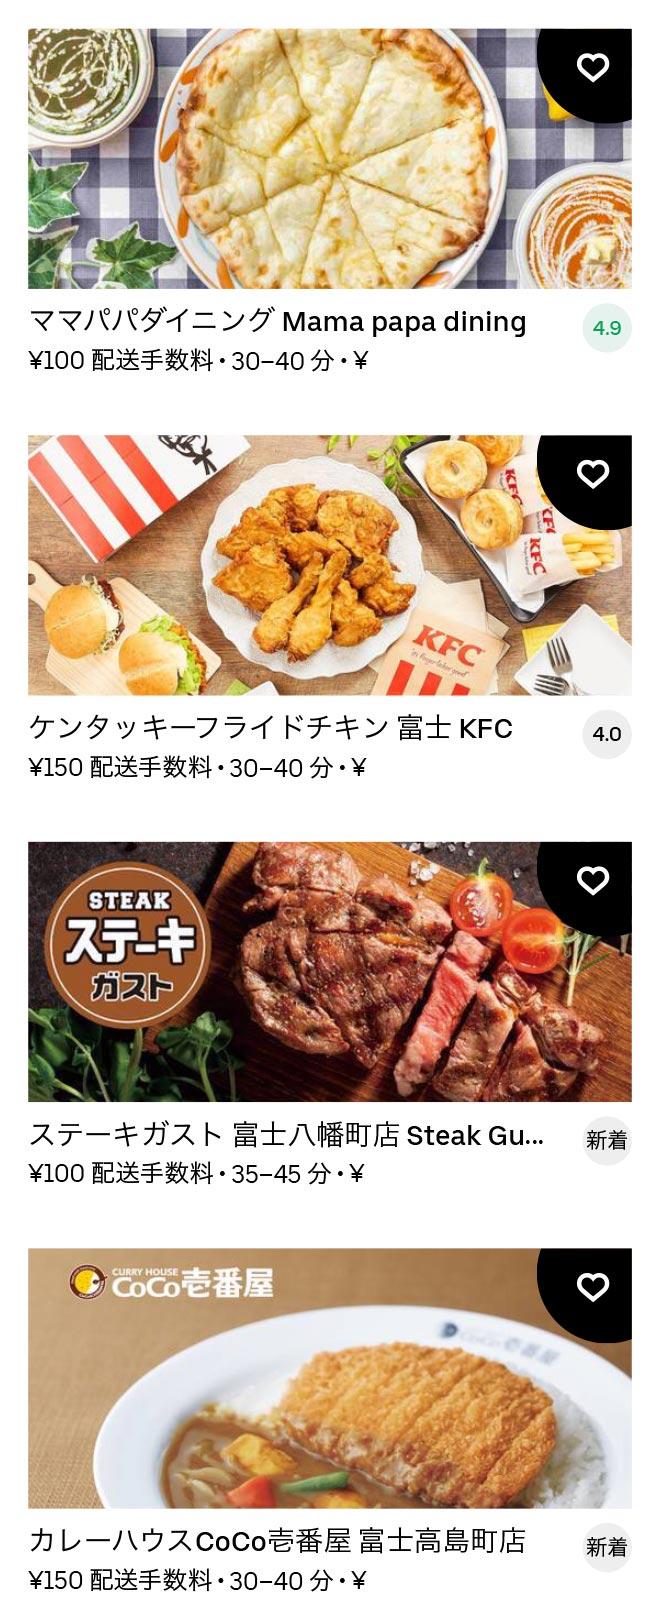 Fuji menu 2012 2